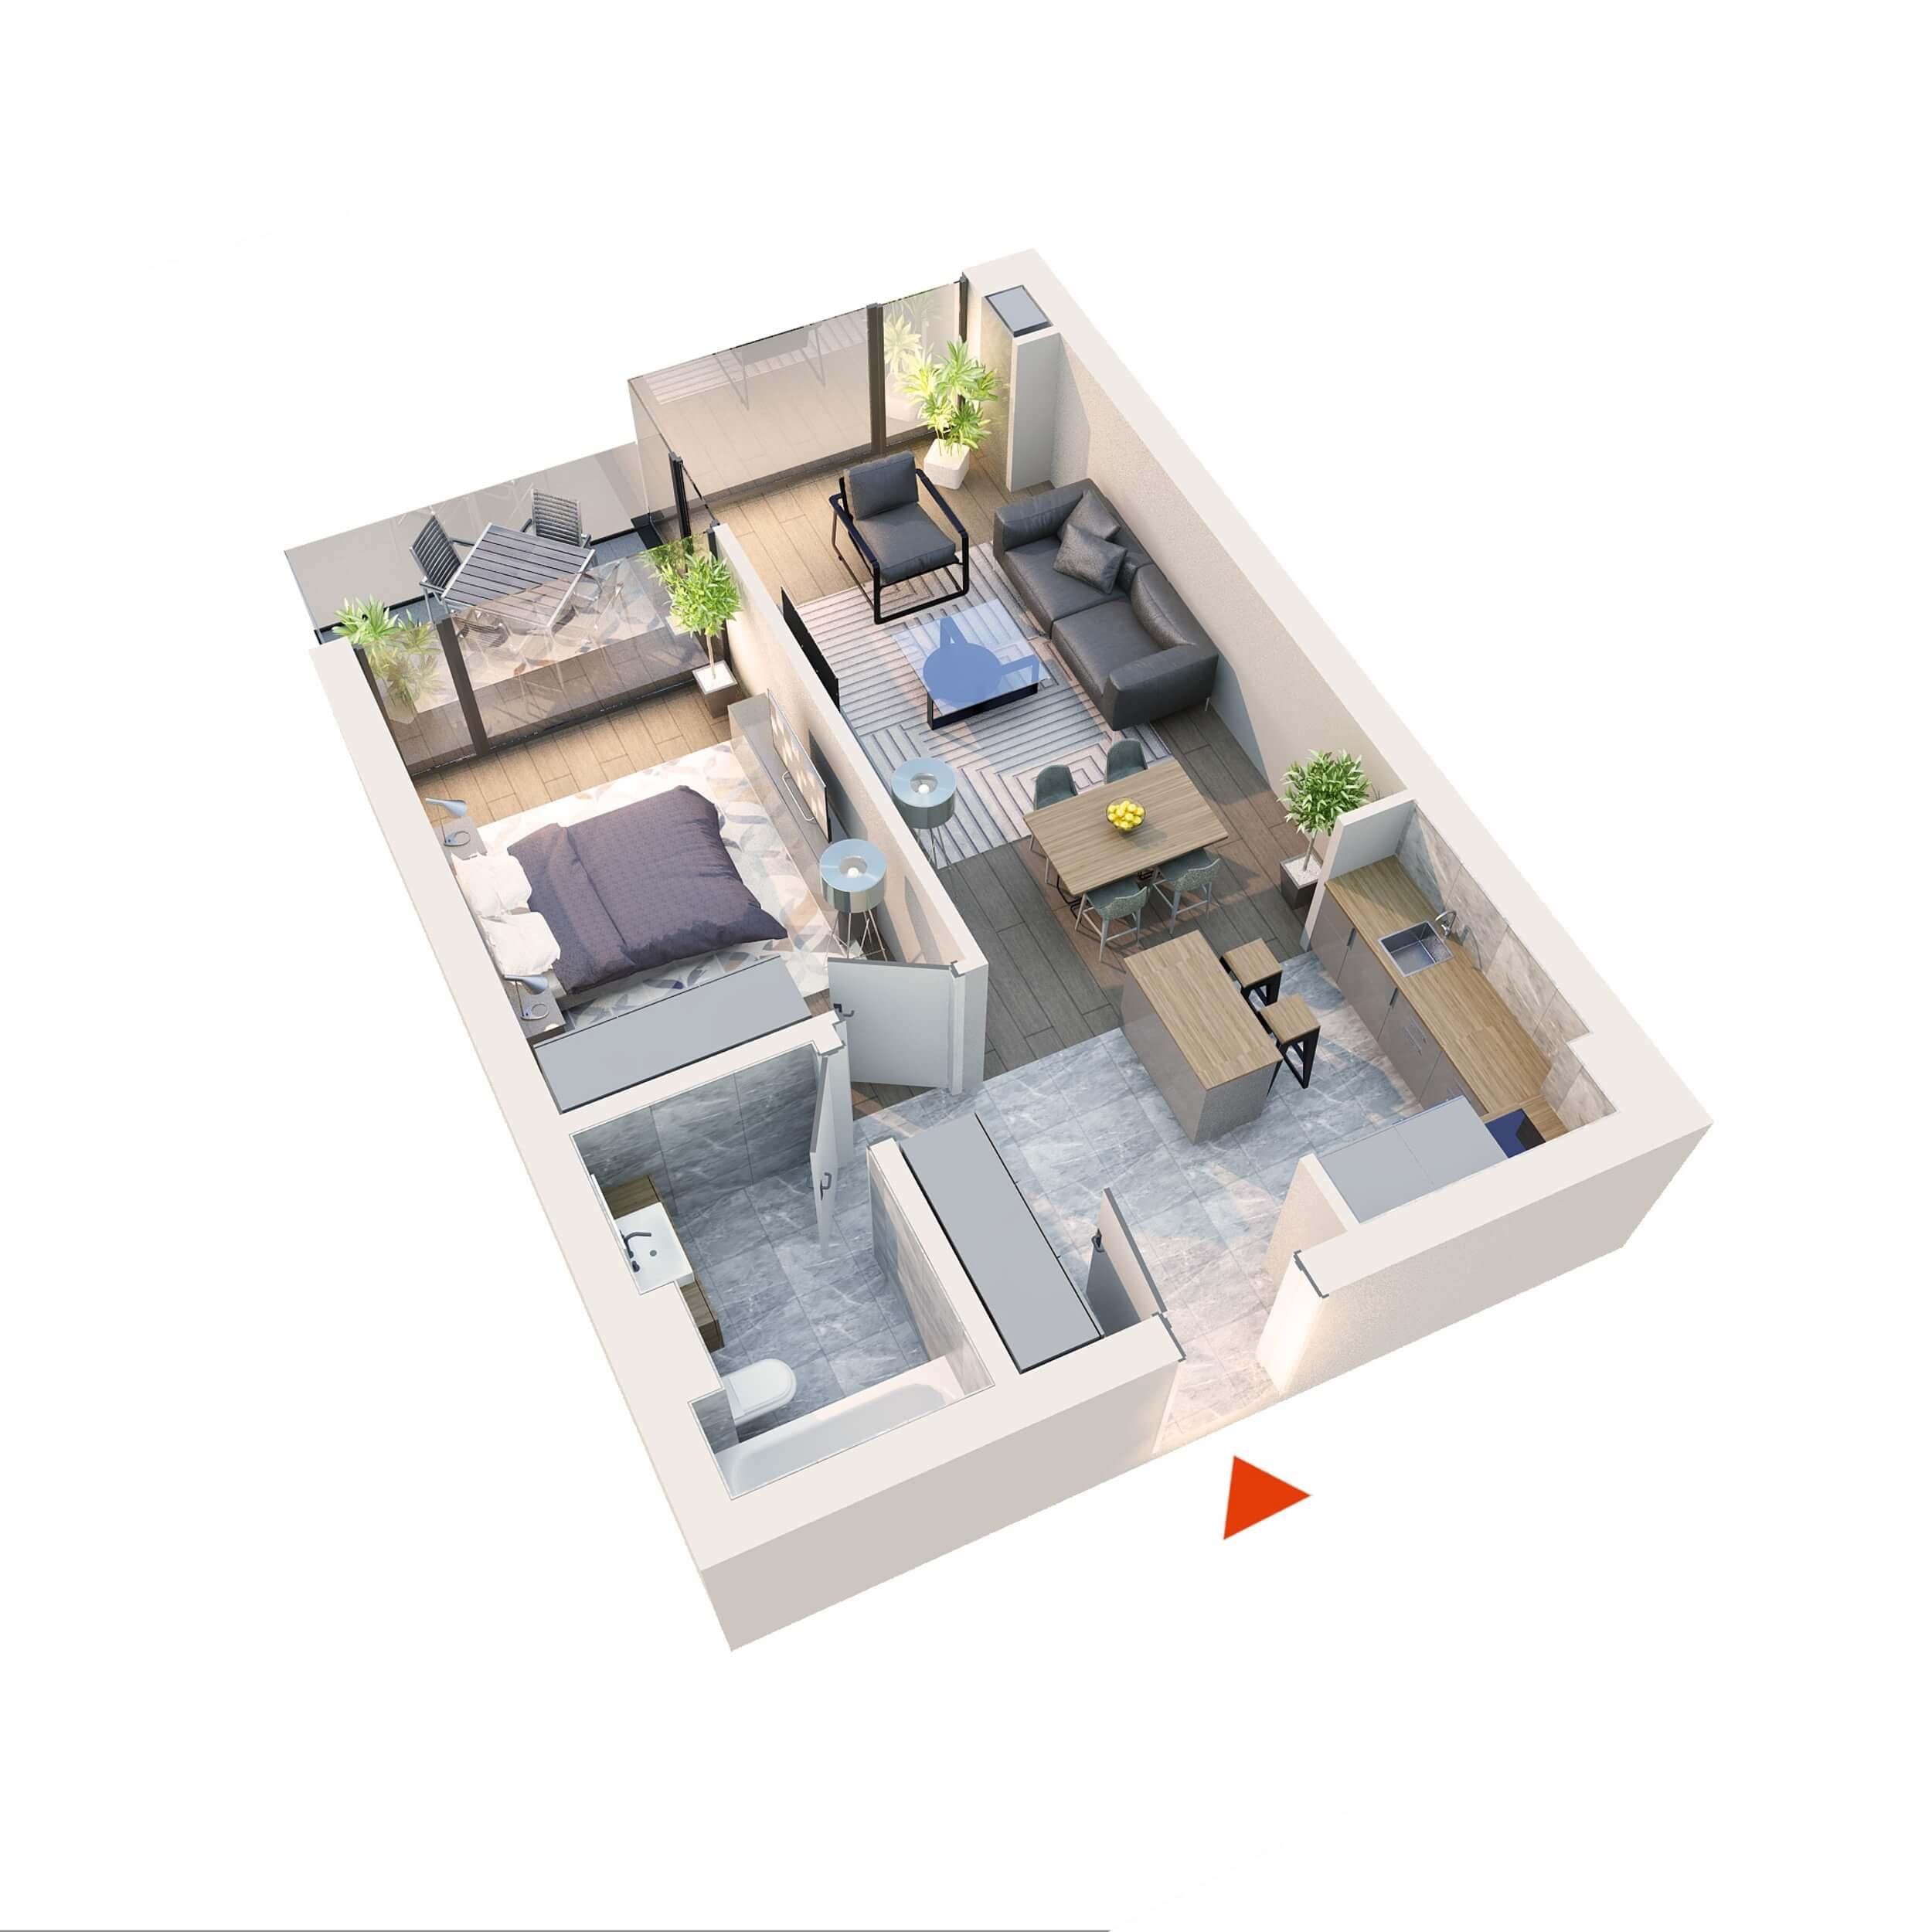 "Apartament 2 camere tip 2D1""' B13 Logie | Etaj 1-4 | Corp C8 | Faza 2"